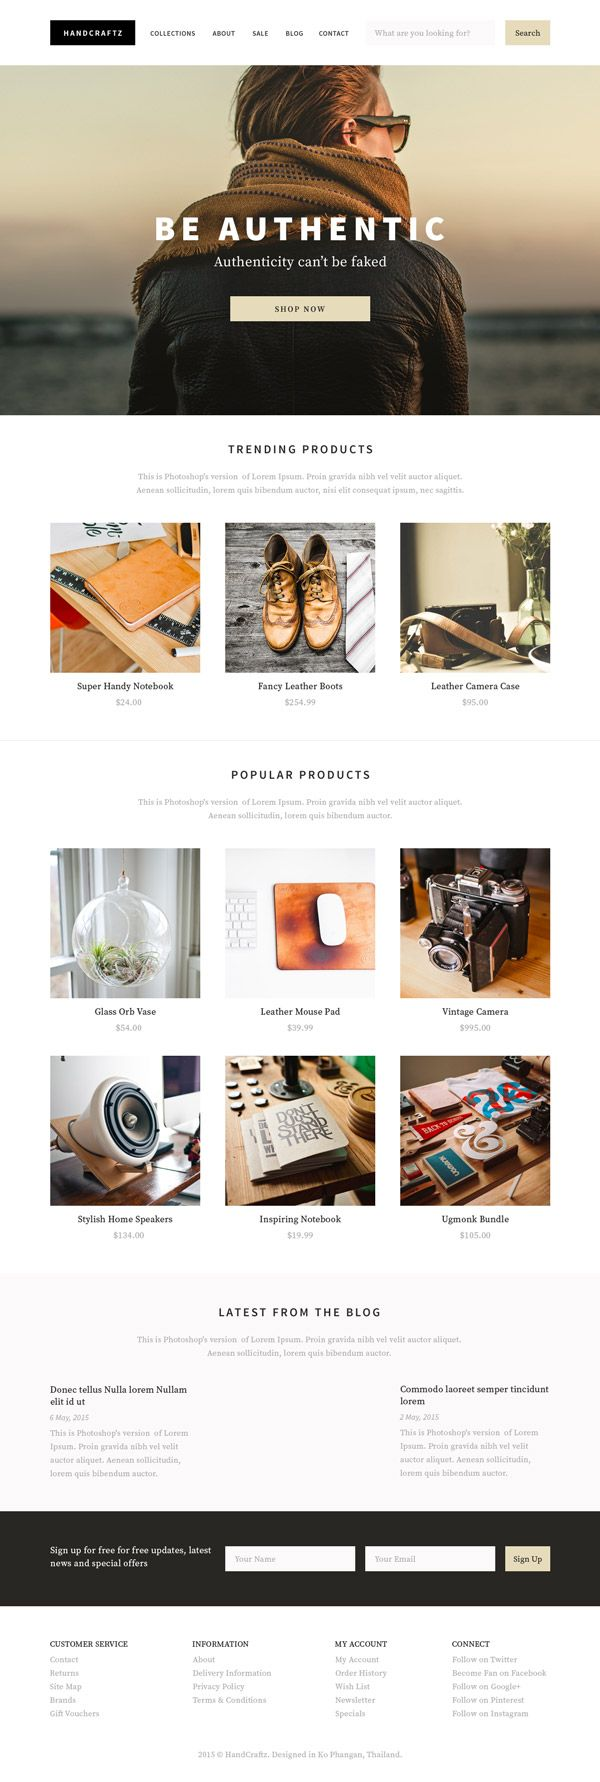 Best 25+ Photoshop web design tutorial ideas on Pinterest